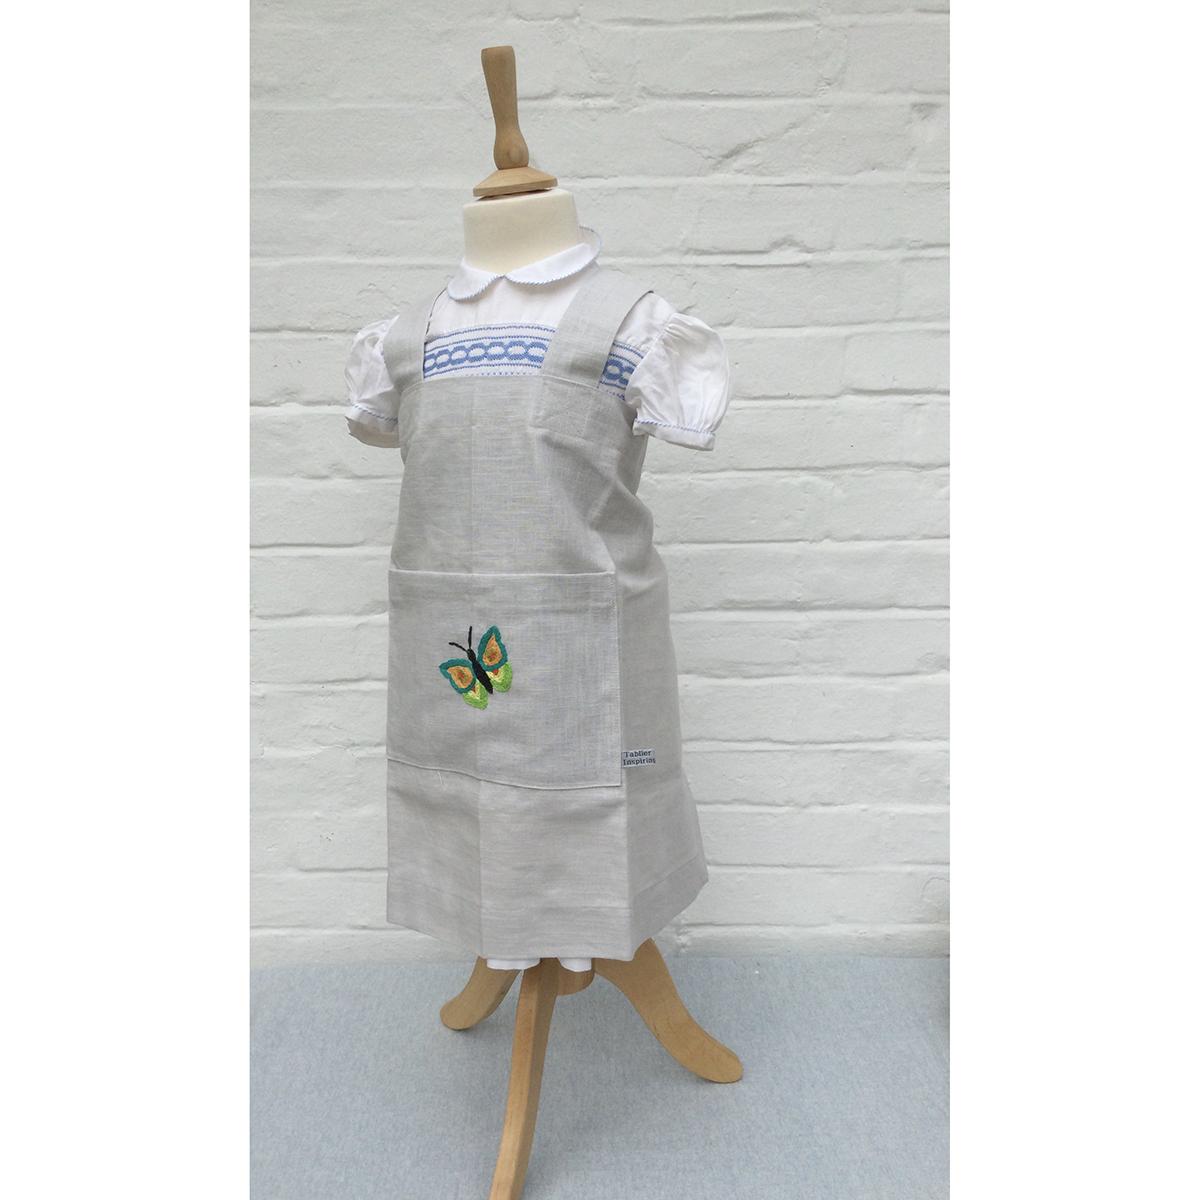 Children's Embroidered Linen Apron